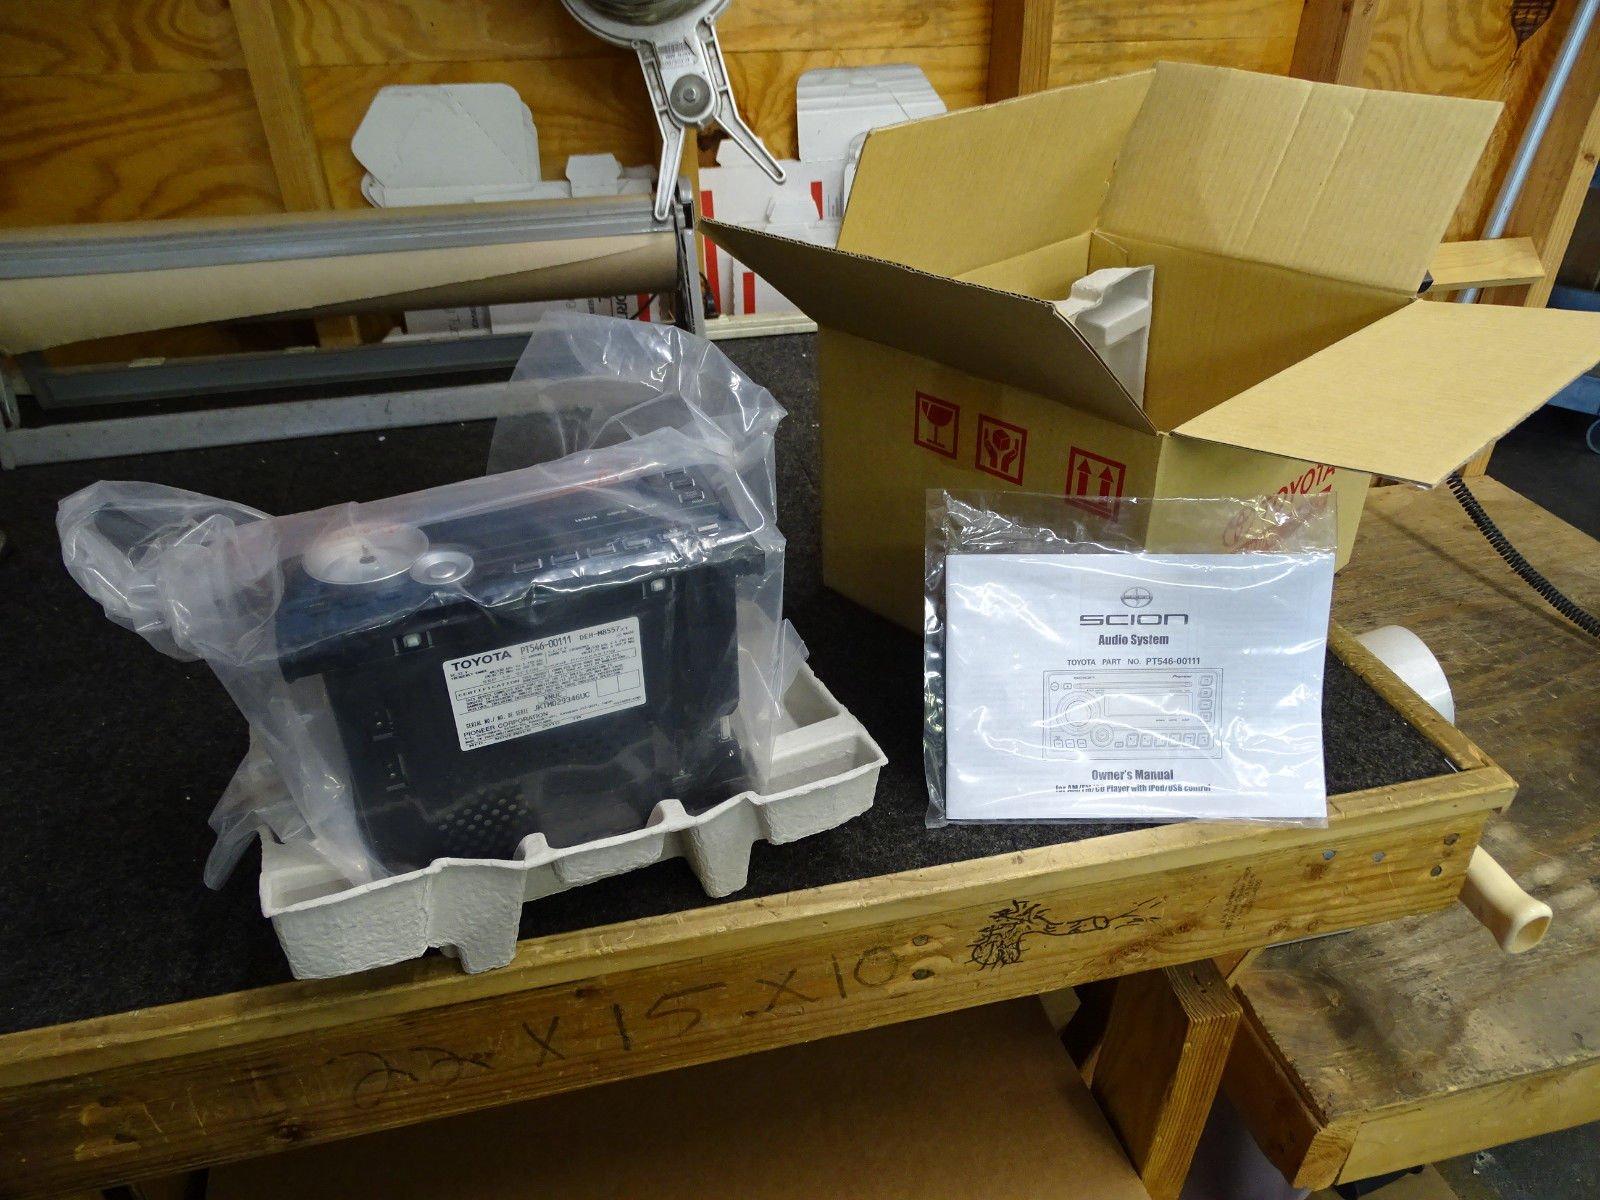 11 12 Scion TC Radio CD Player Pioneer DEH-M8557 PT546-00111 by Pioneer